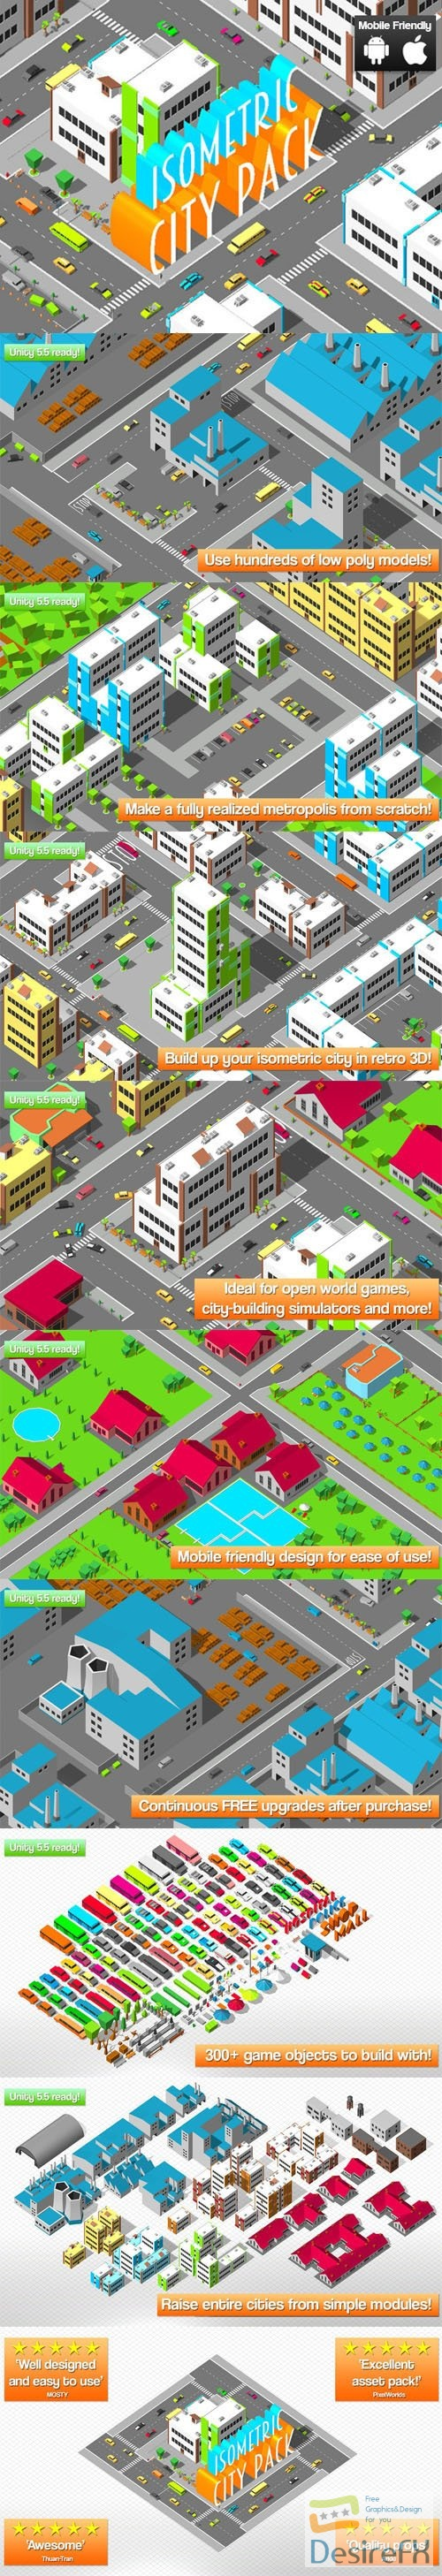 Isometric City Pack 1.0 Unity Asset